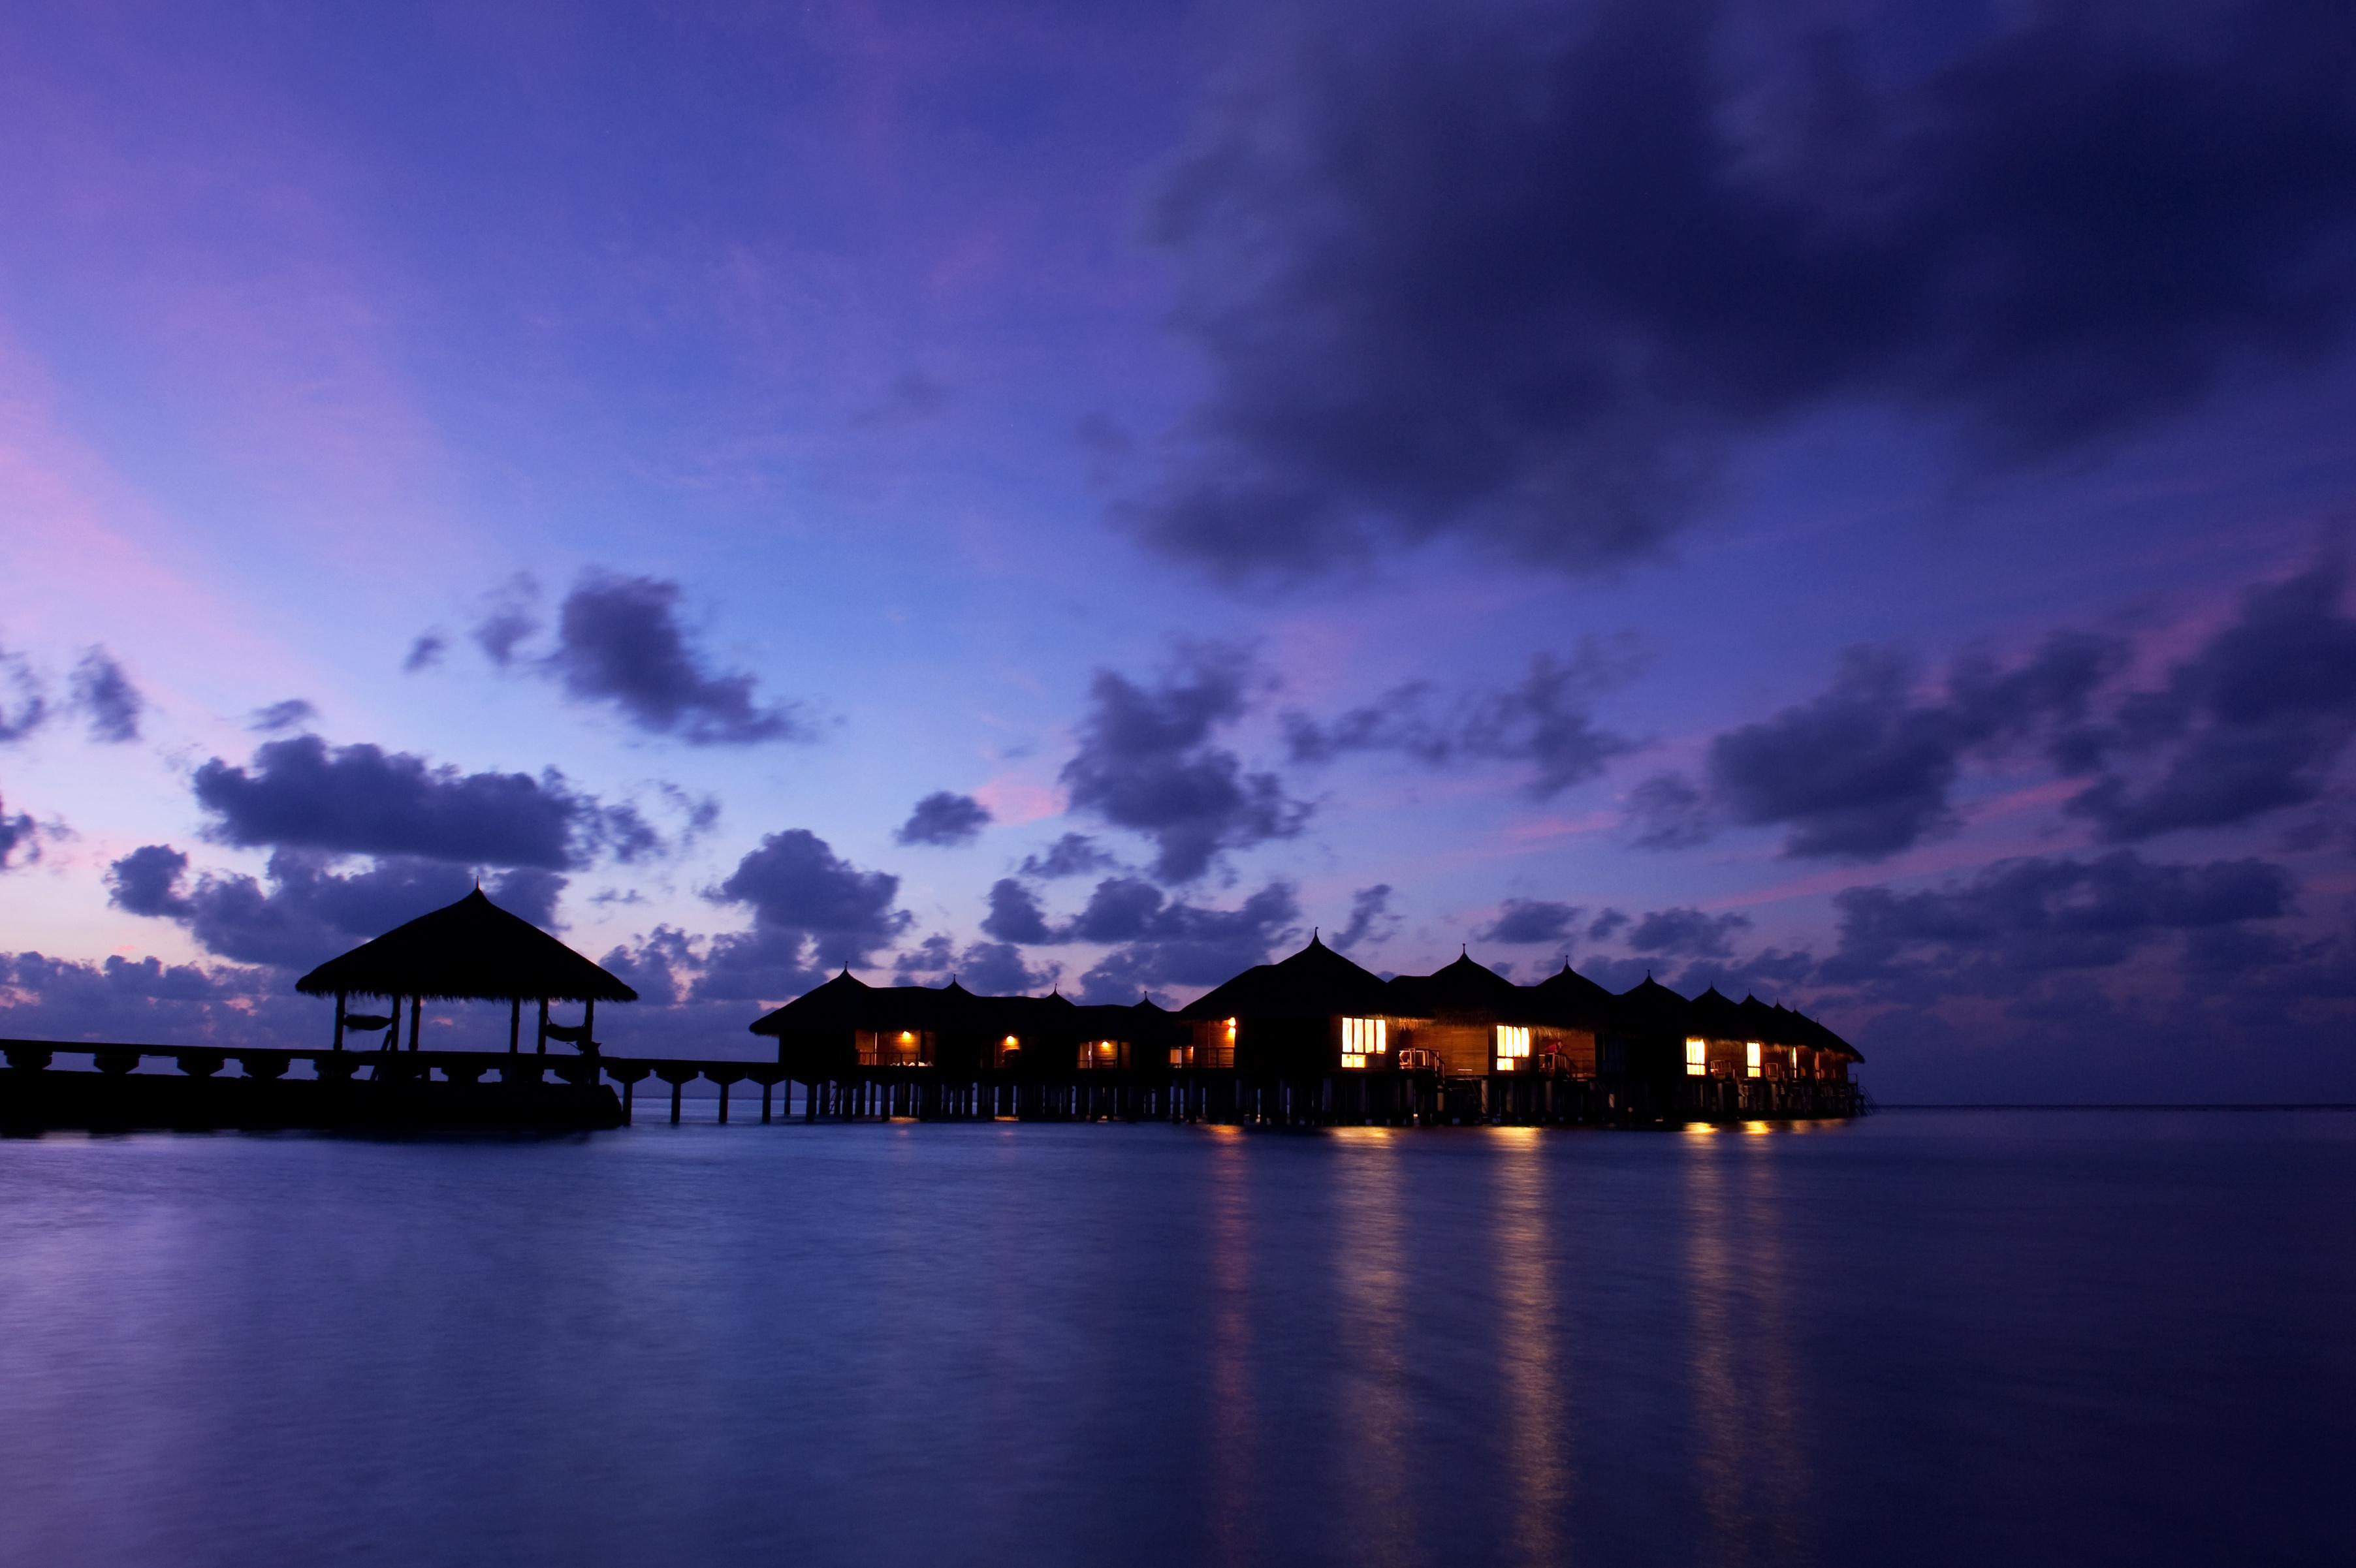 Cottages-on-Maafushivaru-island-wallpaper-wp5604045